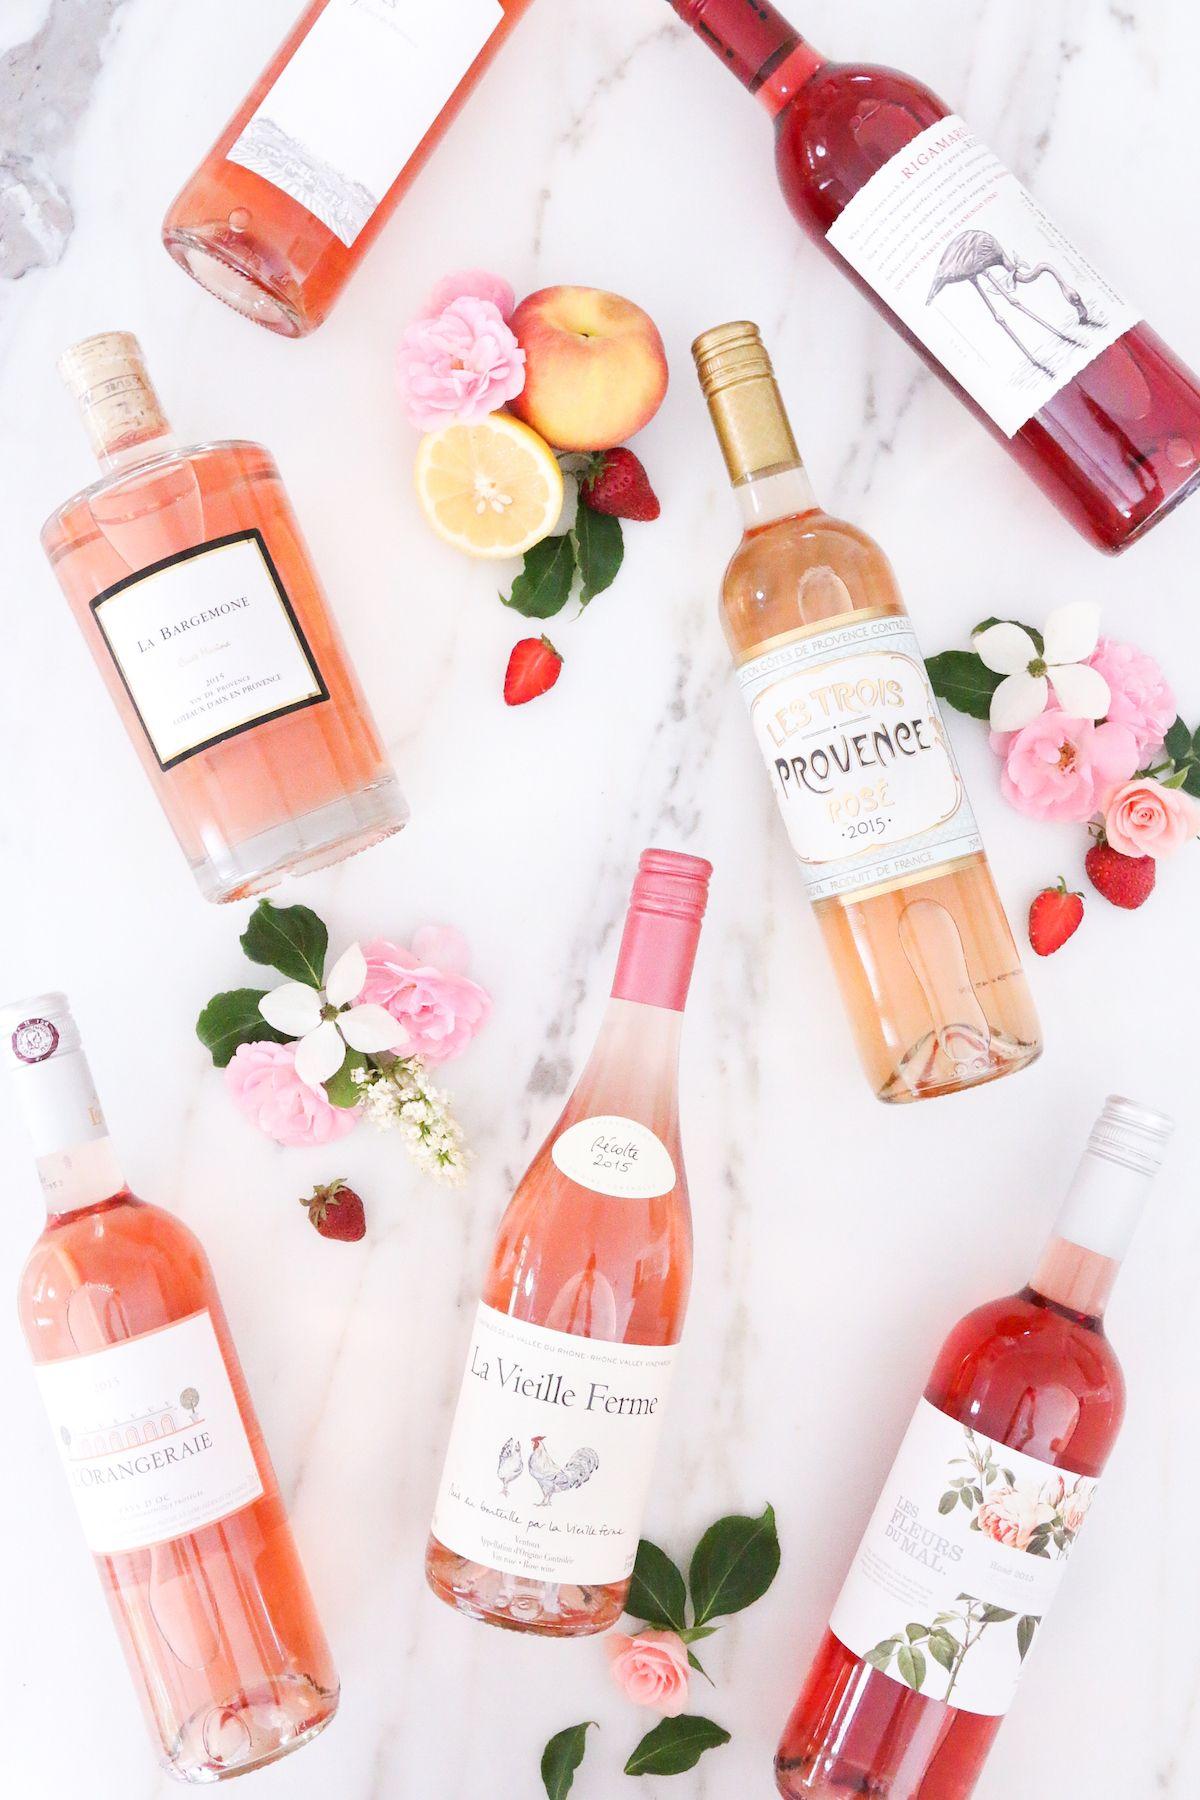 | Yes way Rose | rosé wine #winenotwednesday